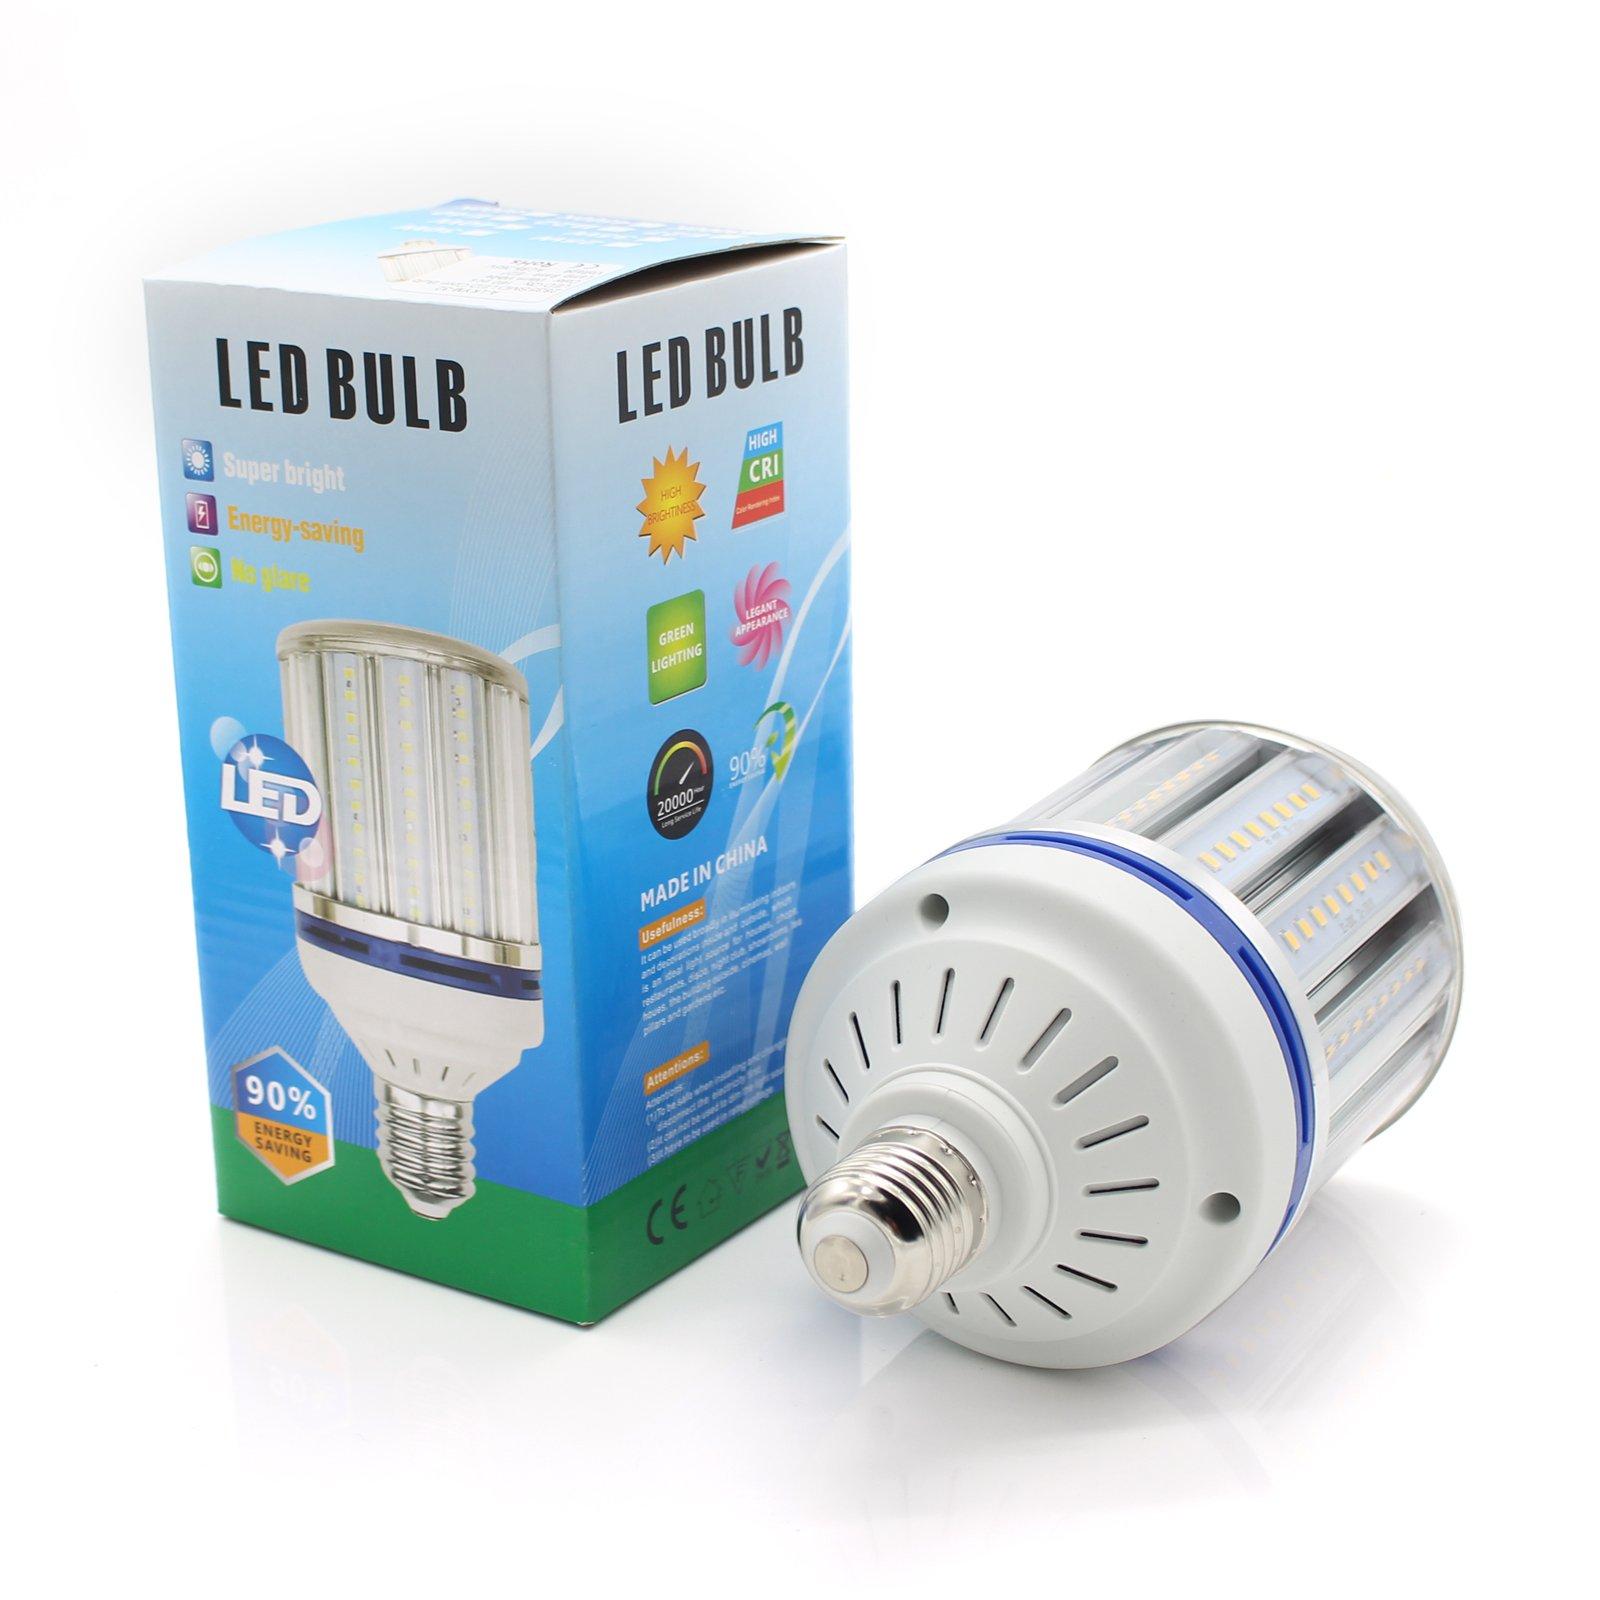 Mininono Ultra Bright LED Bulb Warm White 3000K Medium Edison E26/E27 Base, 30W Commercial Retrofit Light Bulbs, 250-300 Watt Equivalent for Garage Warehouse Home High Power Lights